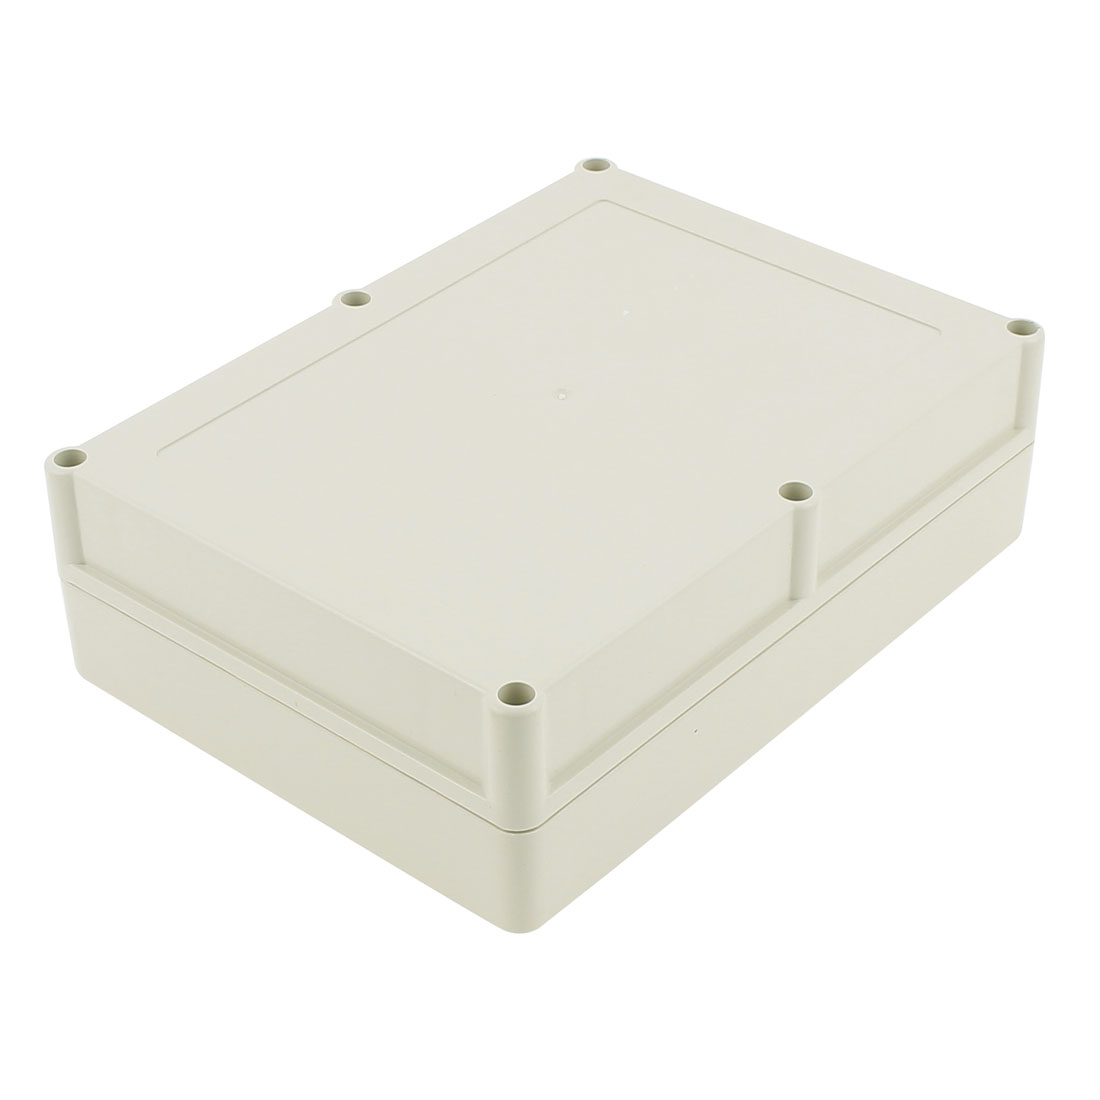 210 x 155 x 63mm Dustproof IP65 Junction Box DIY Terminal Connecting Enclosure